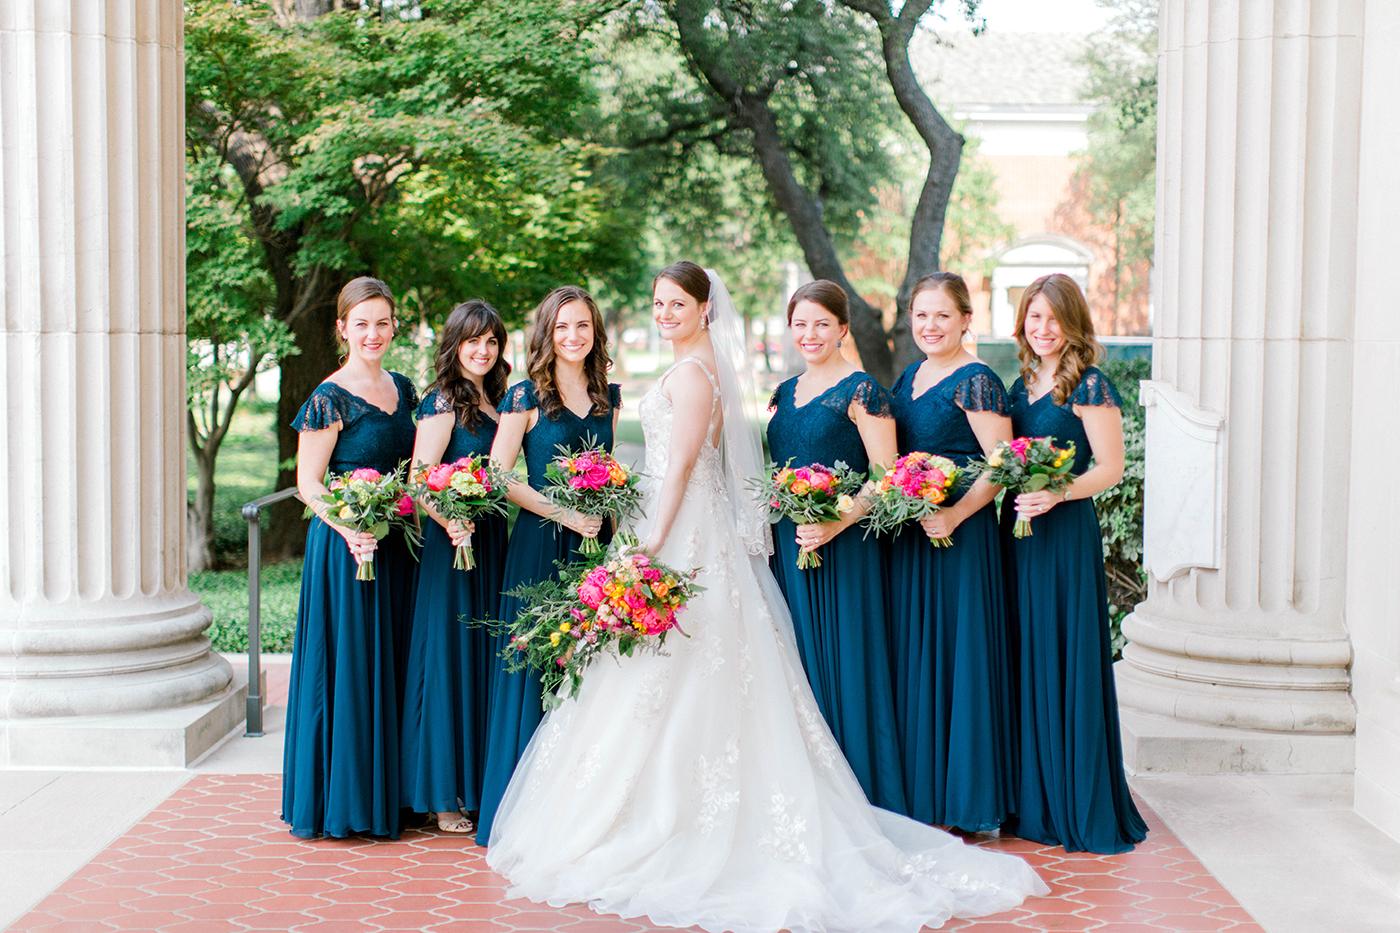 Dallas TX Wedding Planner - Allday Events - Hall on Dragon Wedding - 00028.jpg